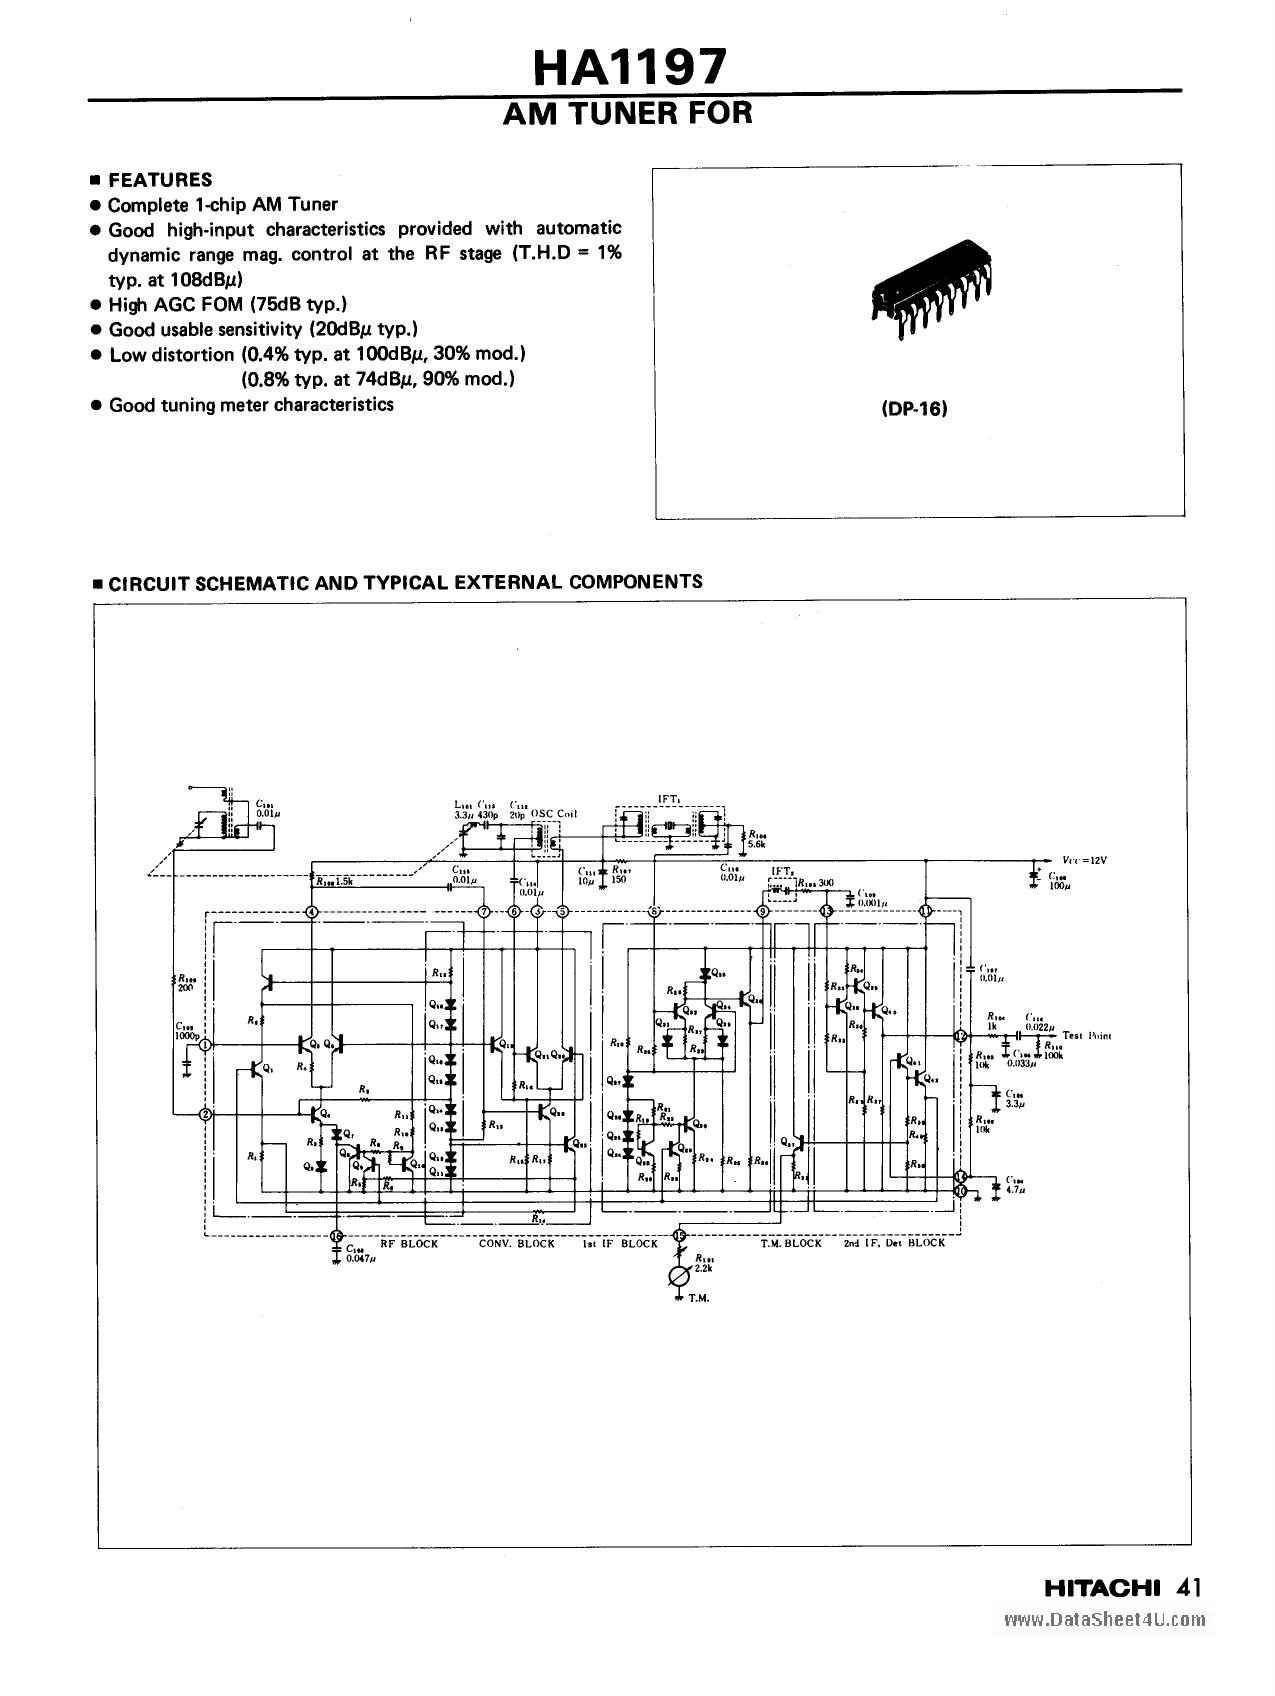 HA1197 datasheet